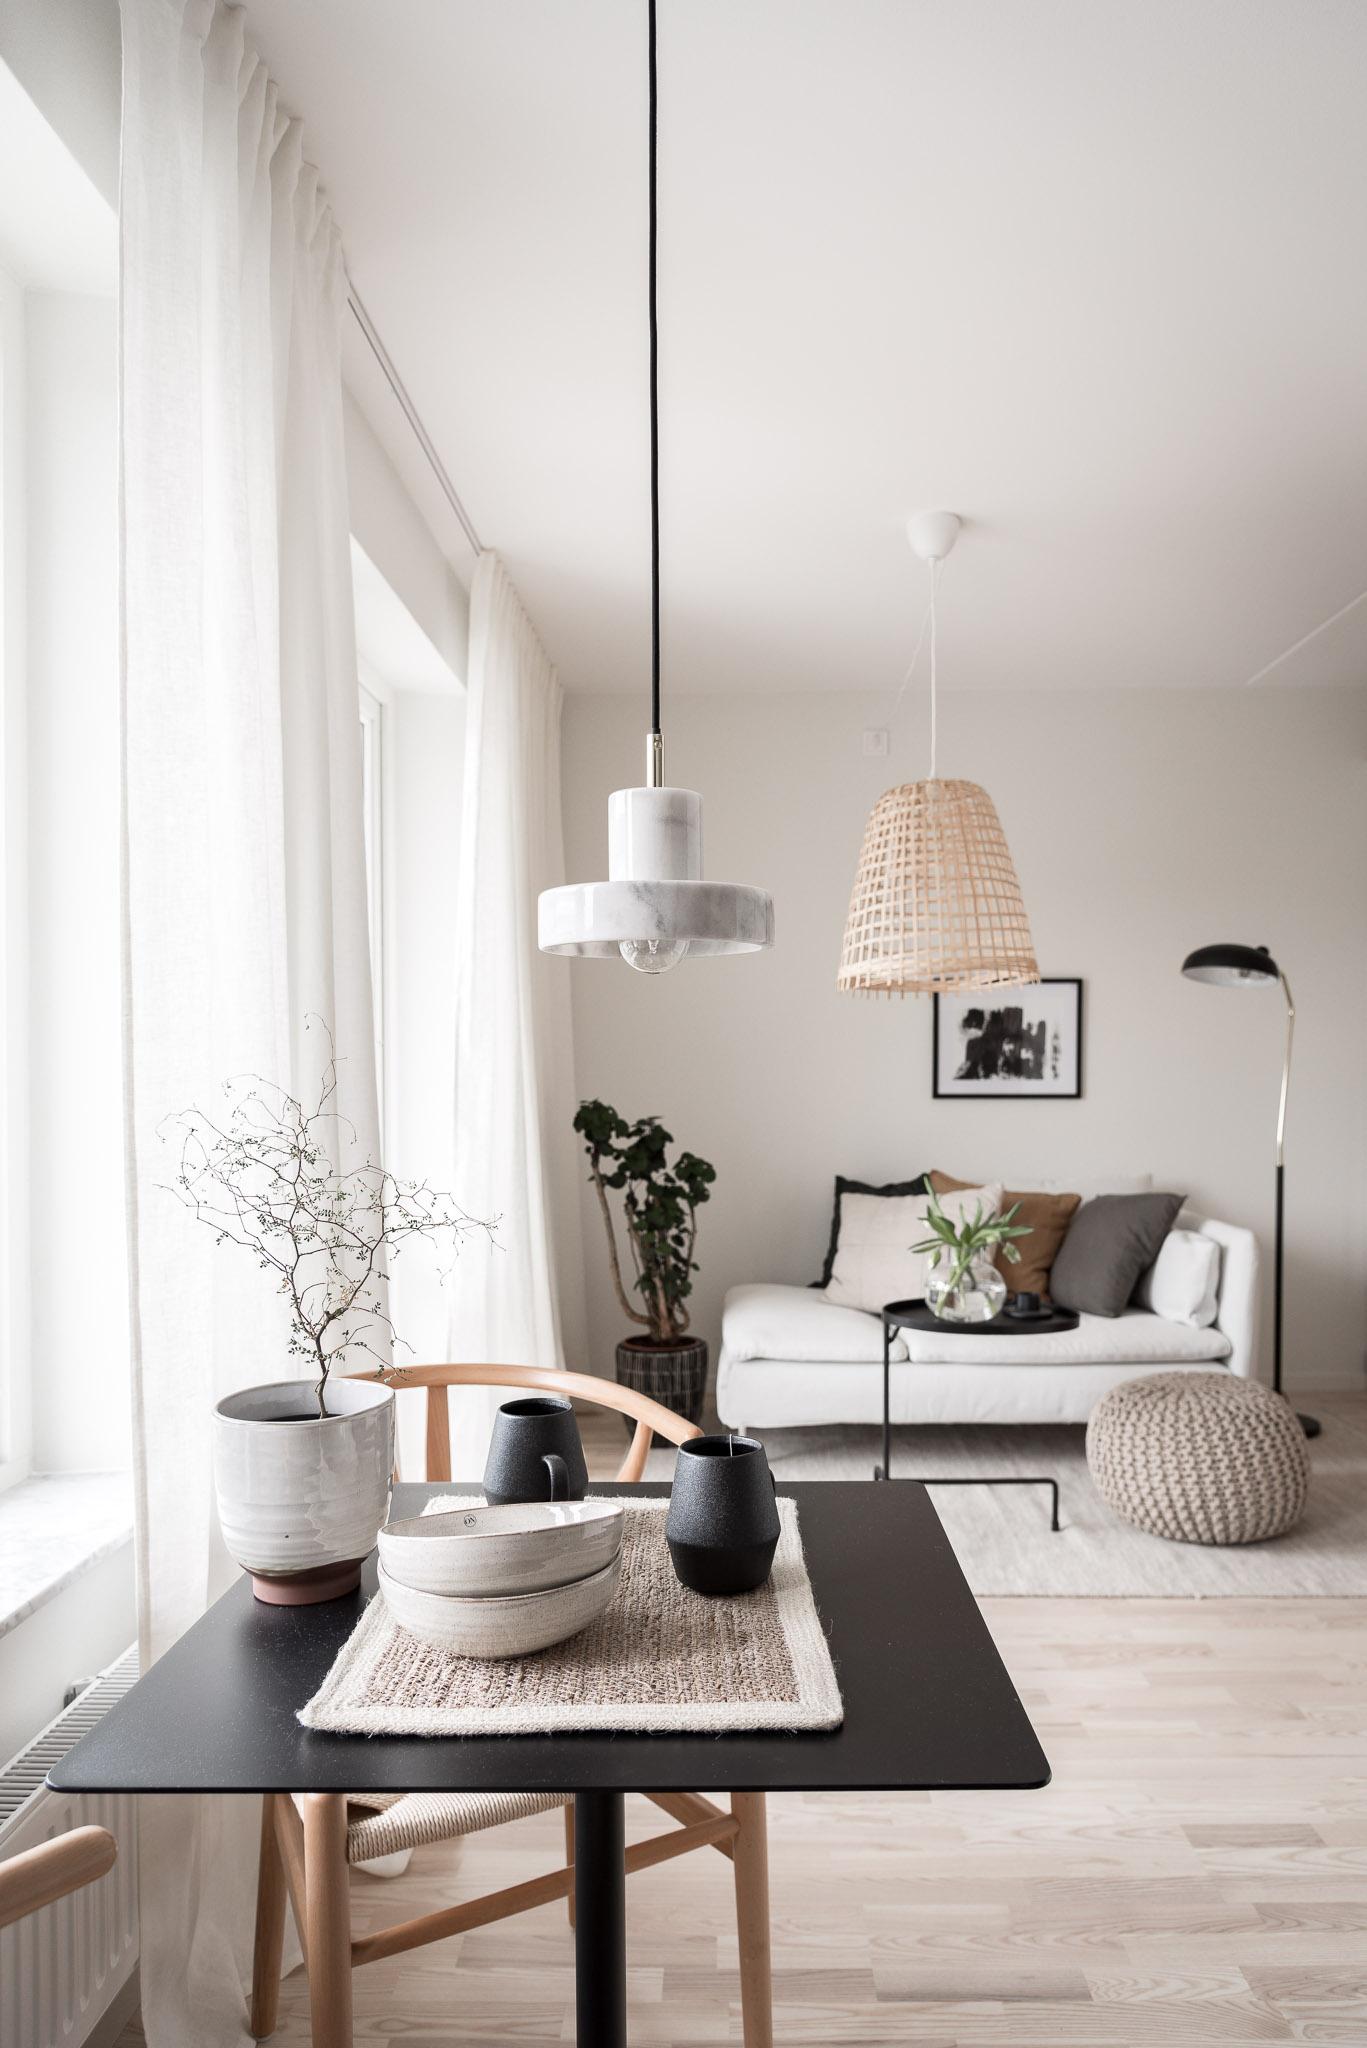 Homestyling Göteborg , Ebbe Lieberathsgata, Tom Dixon lampa, Y-stol, korglampa, Studio In